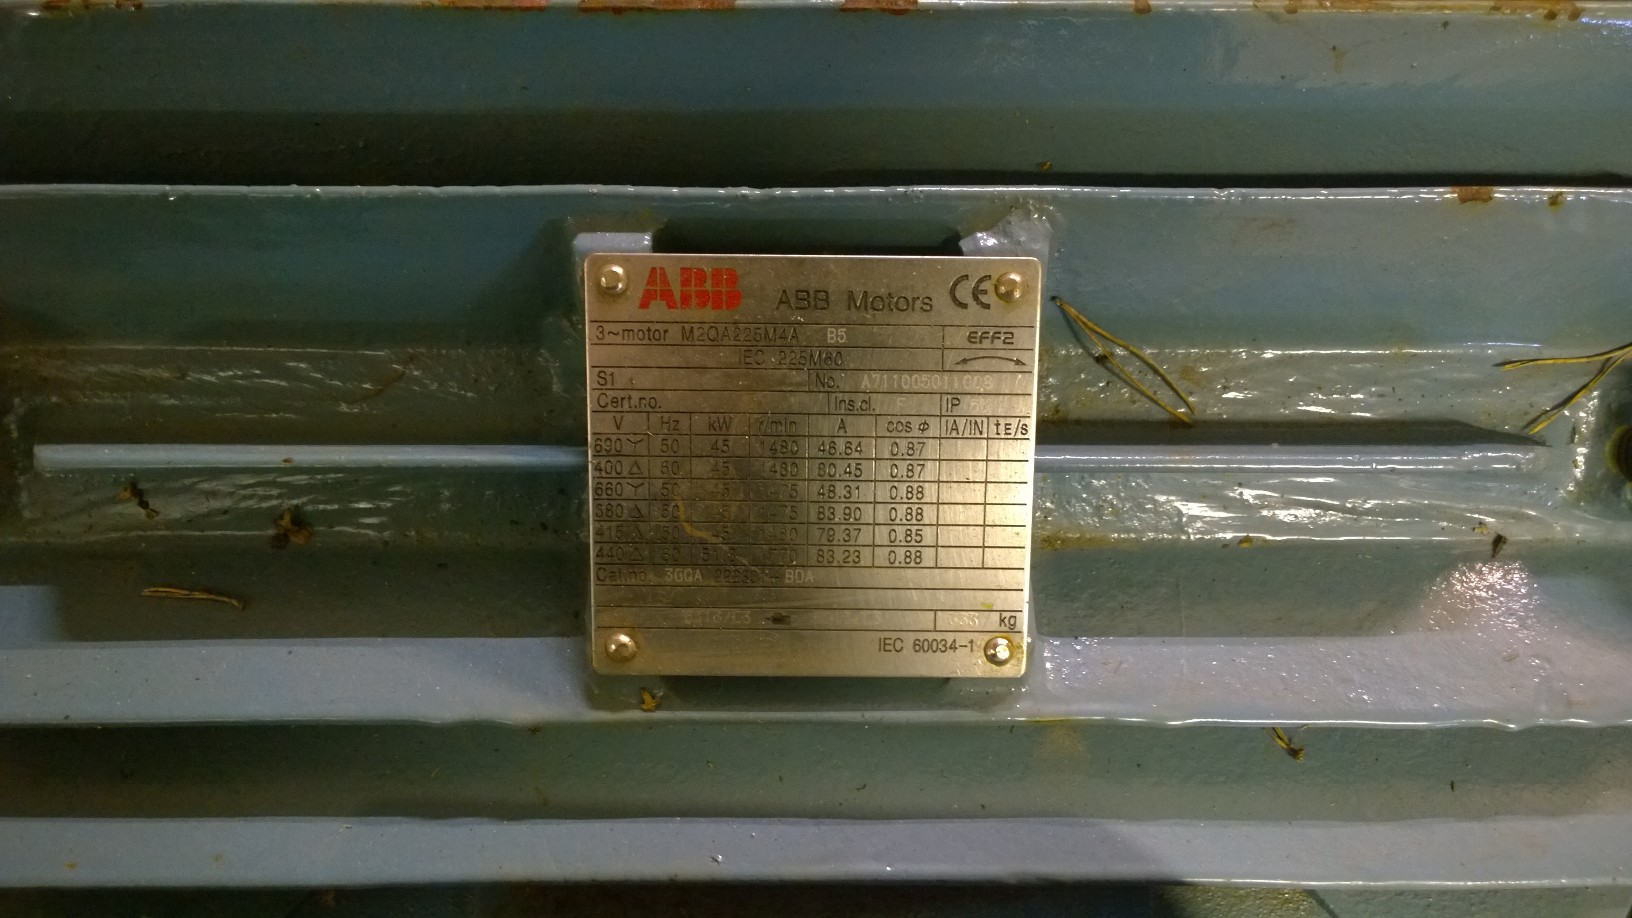 45KW/1500 B5 Sähkömoottori ABB M2QA225M4QA